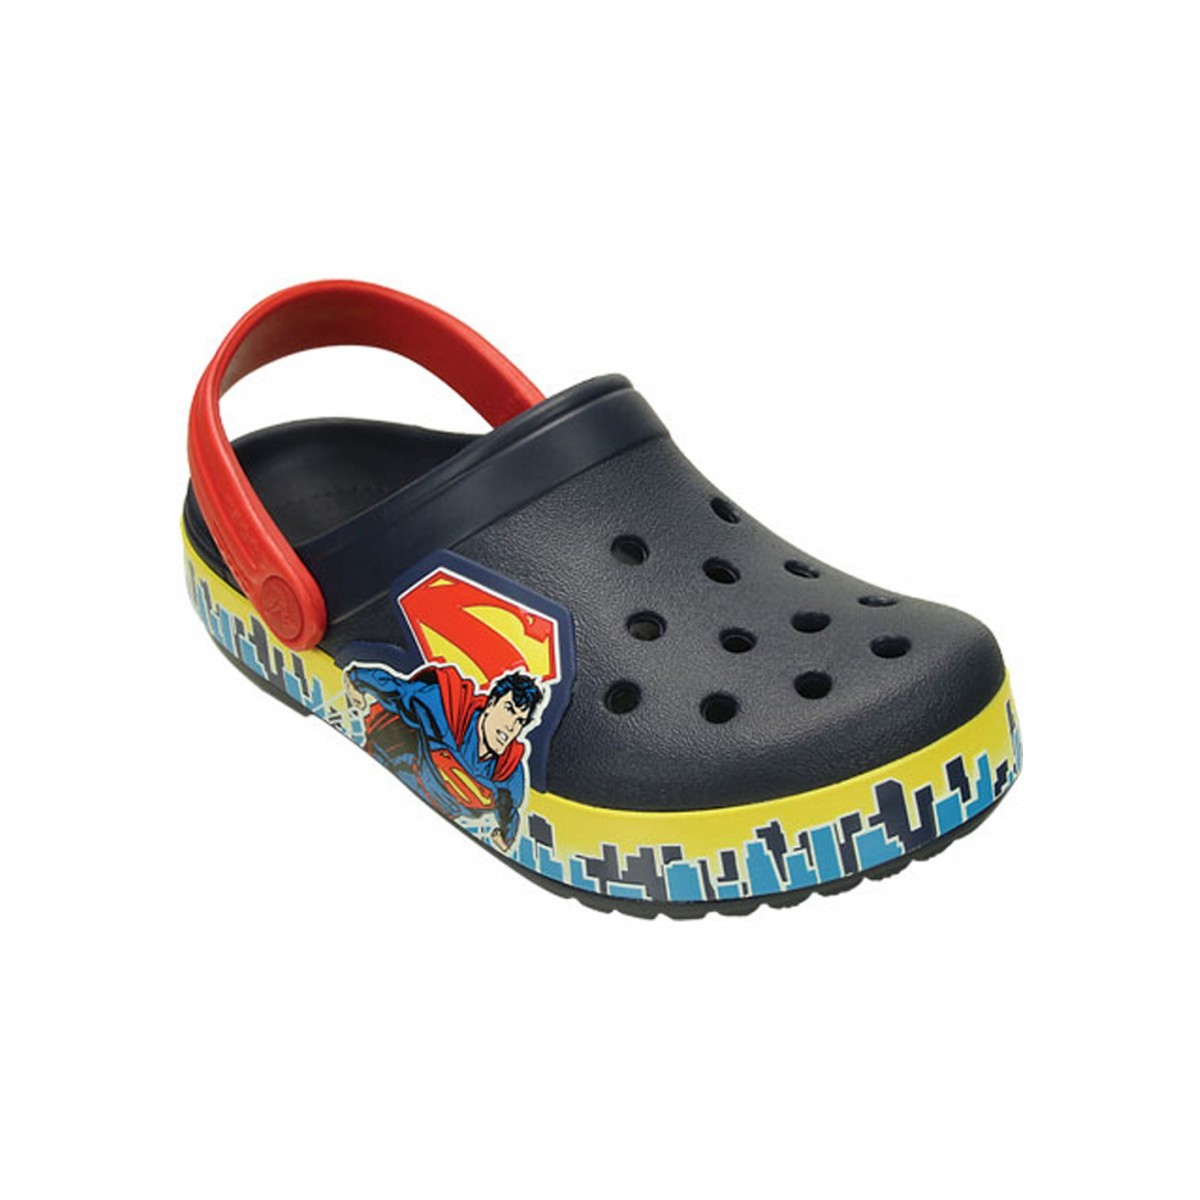 Sandália Crocs Infantil Super-Homem 86f242b53a